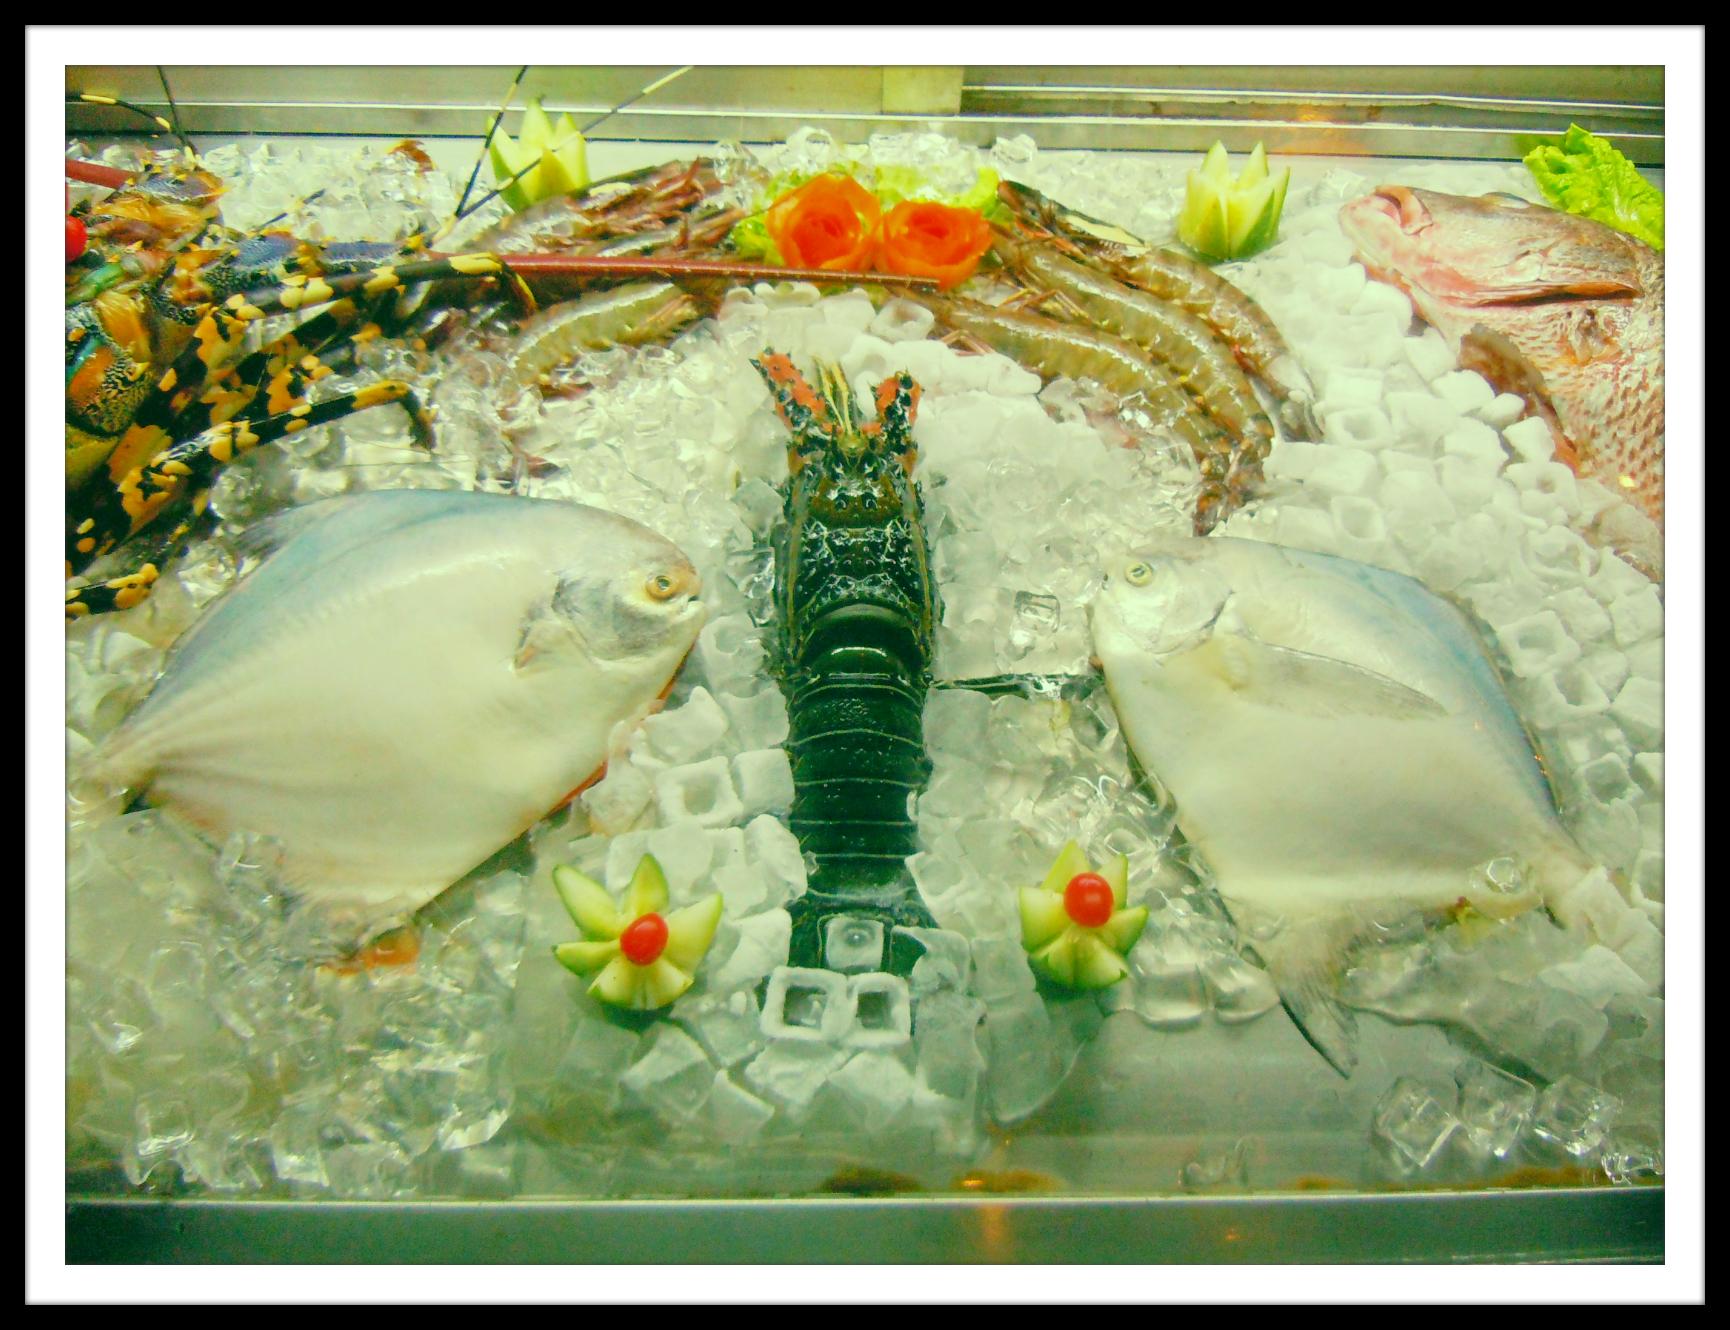 Seafood options on display at Martin's Corner